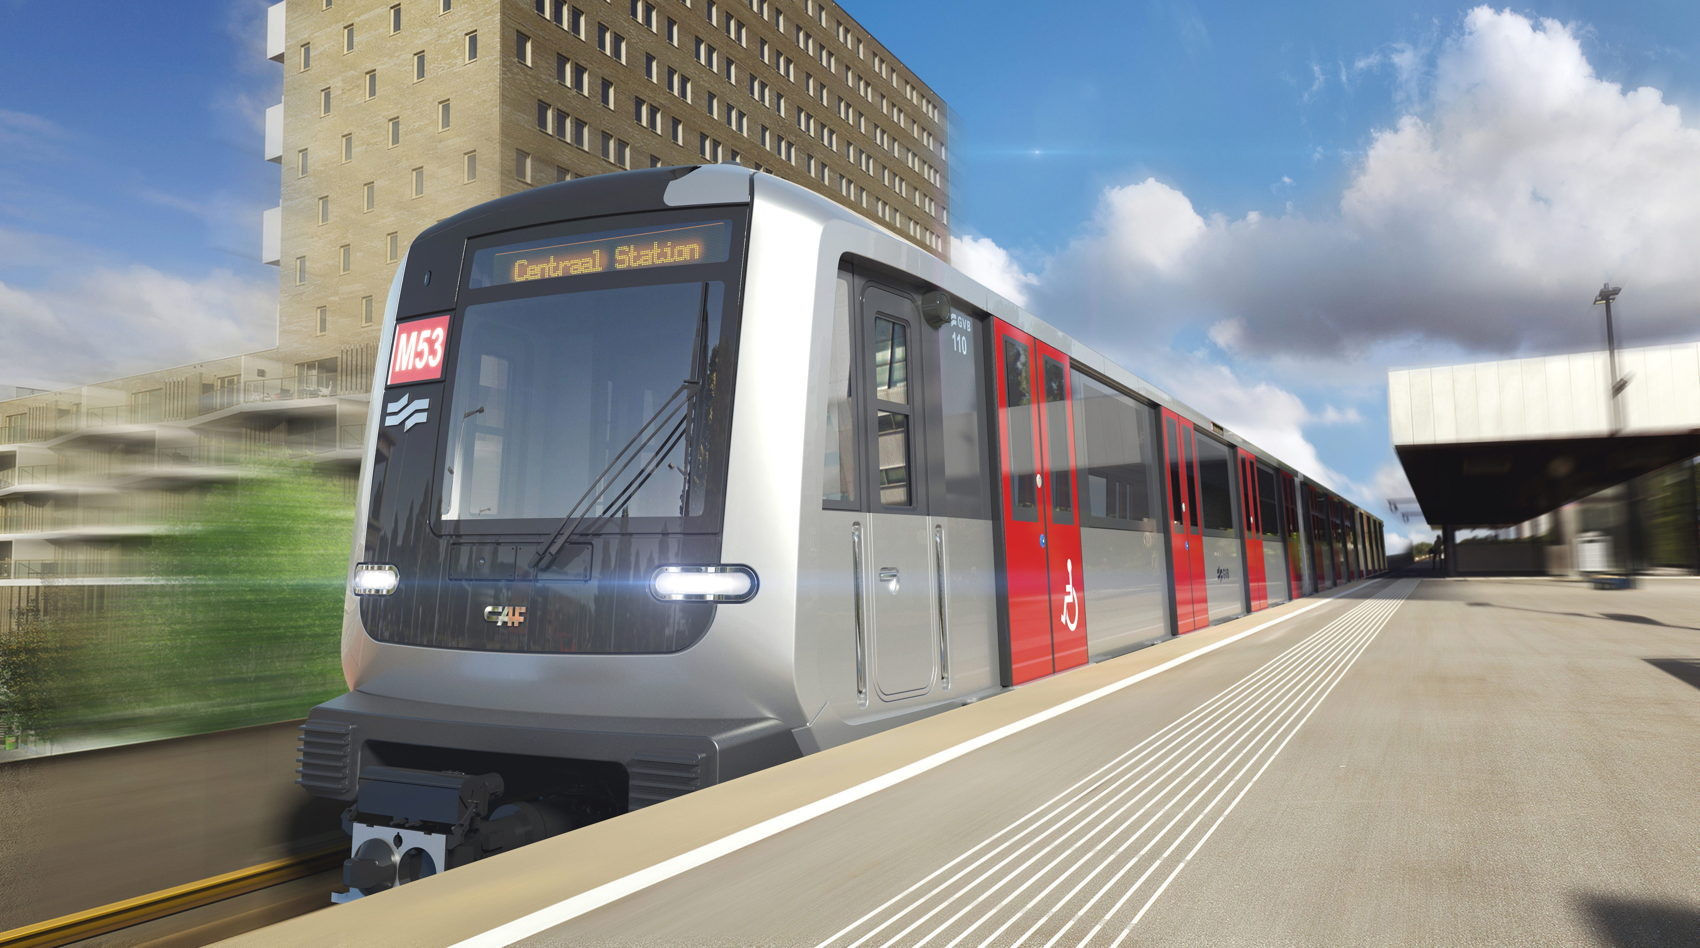 20181128-Beeld impressie nieuwe M7 metro GVB Amsterdam_city view_hr